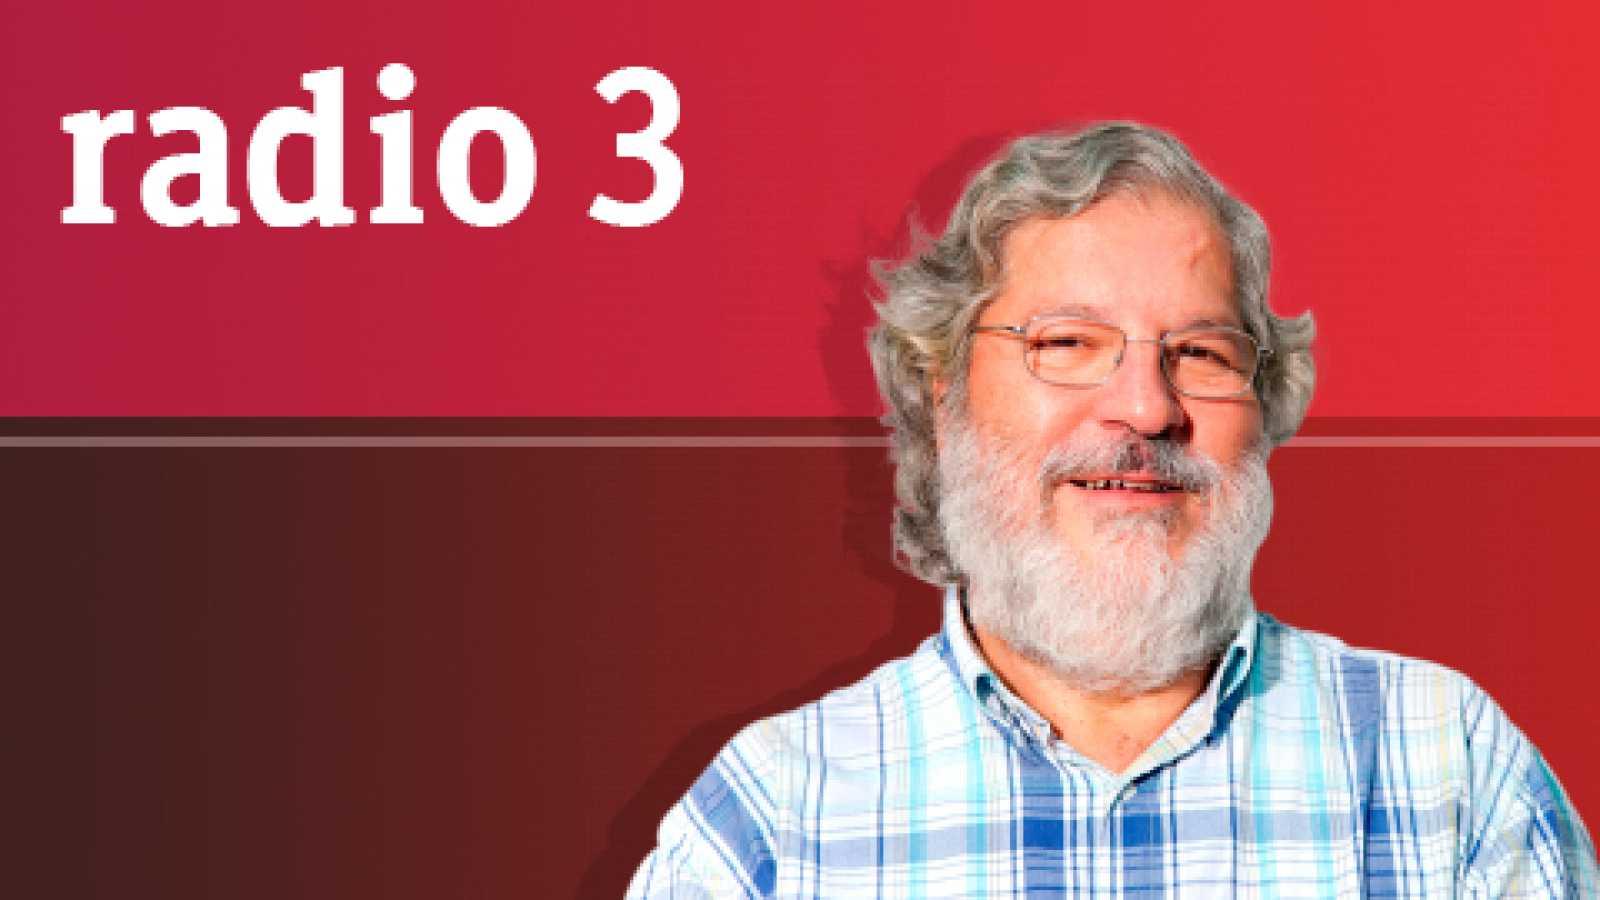 Discópolis - 10.858: Sesiones tesoro RTVE 40: Triana - Storm - 11/02/20 - escuchar ahora